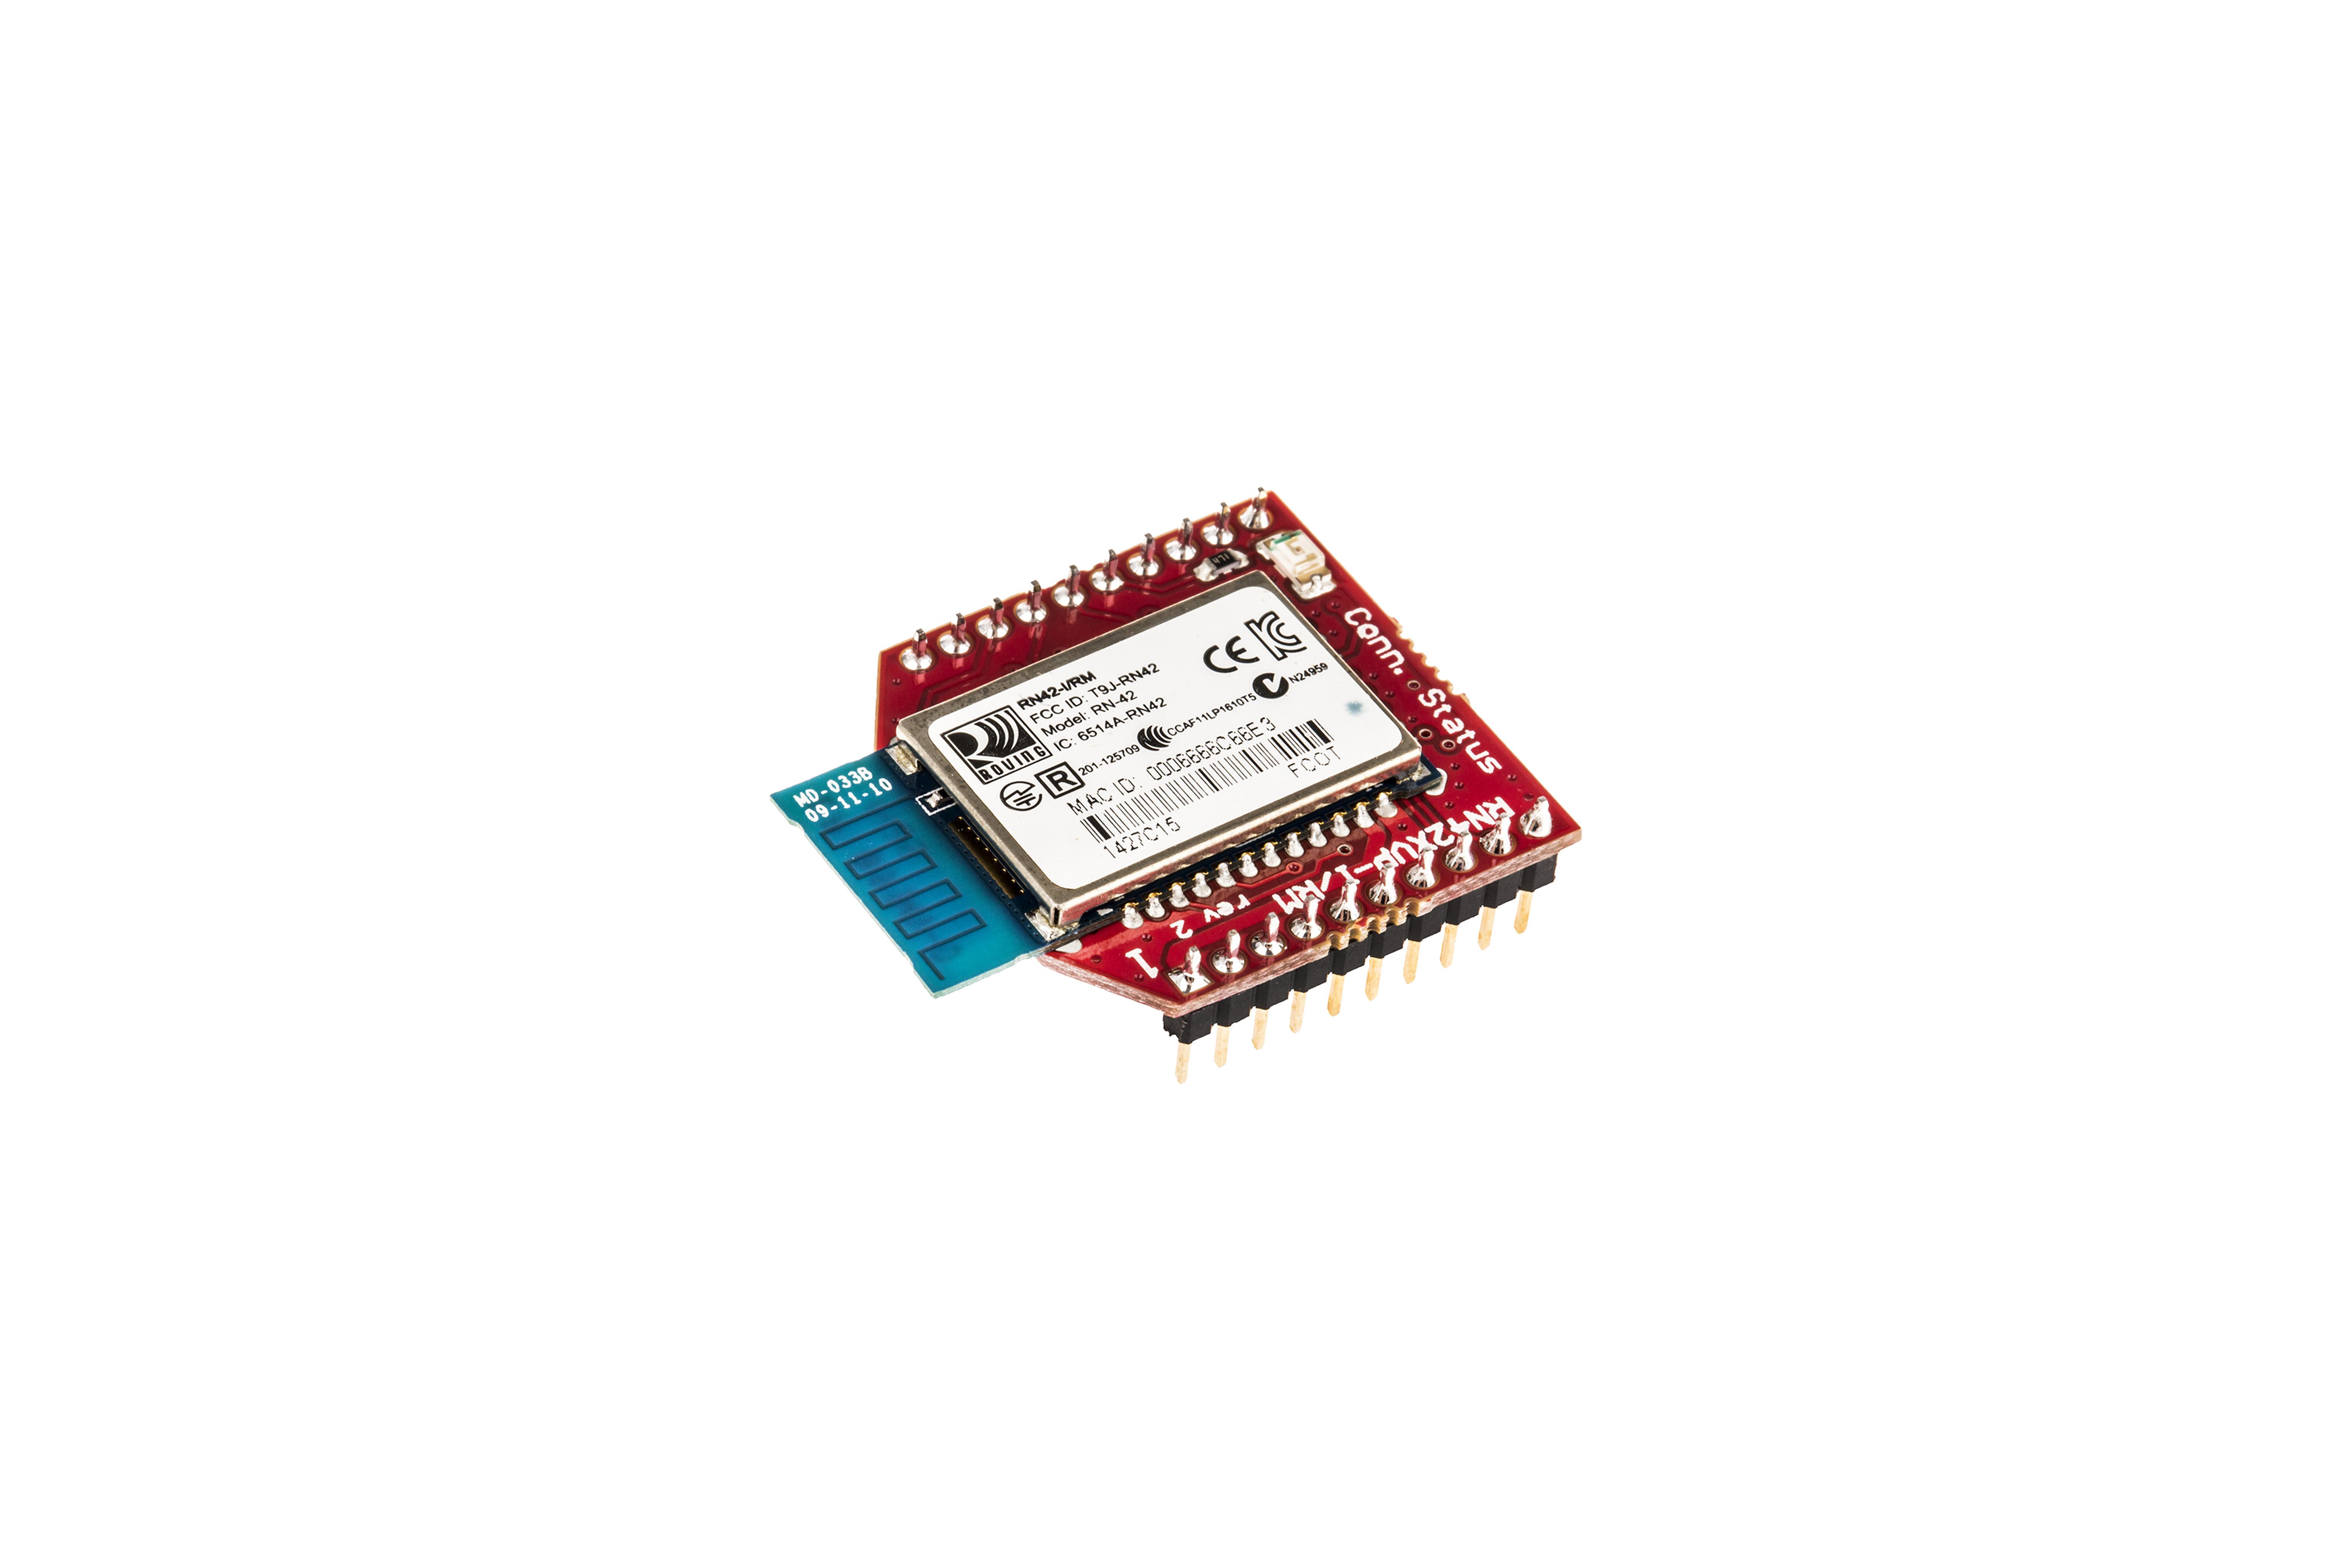 Antenna PCB modulo presa Bluetooth RN42